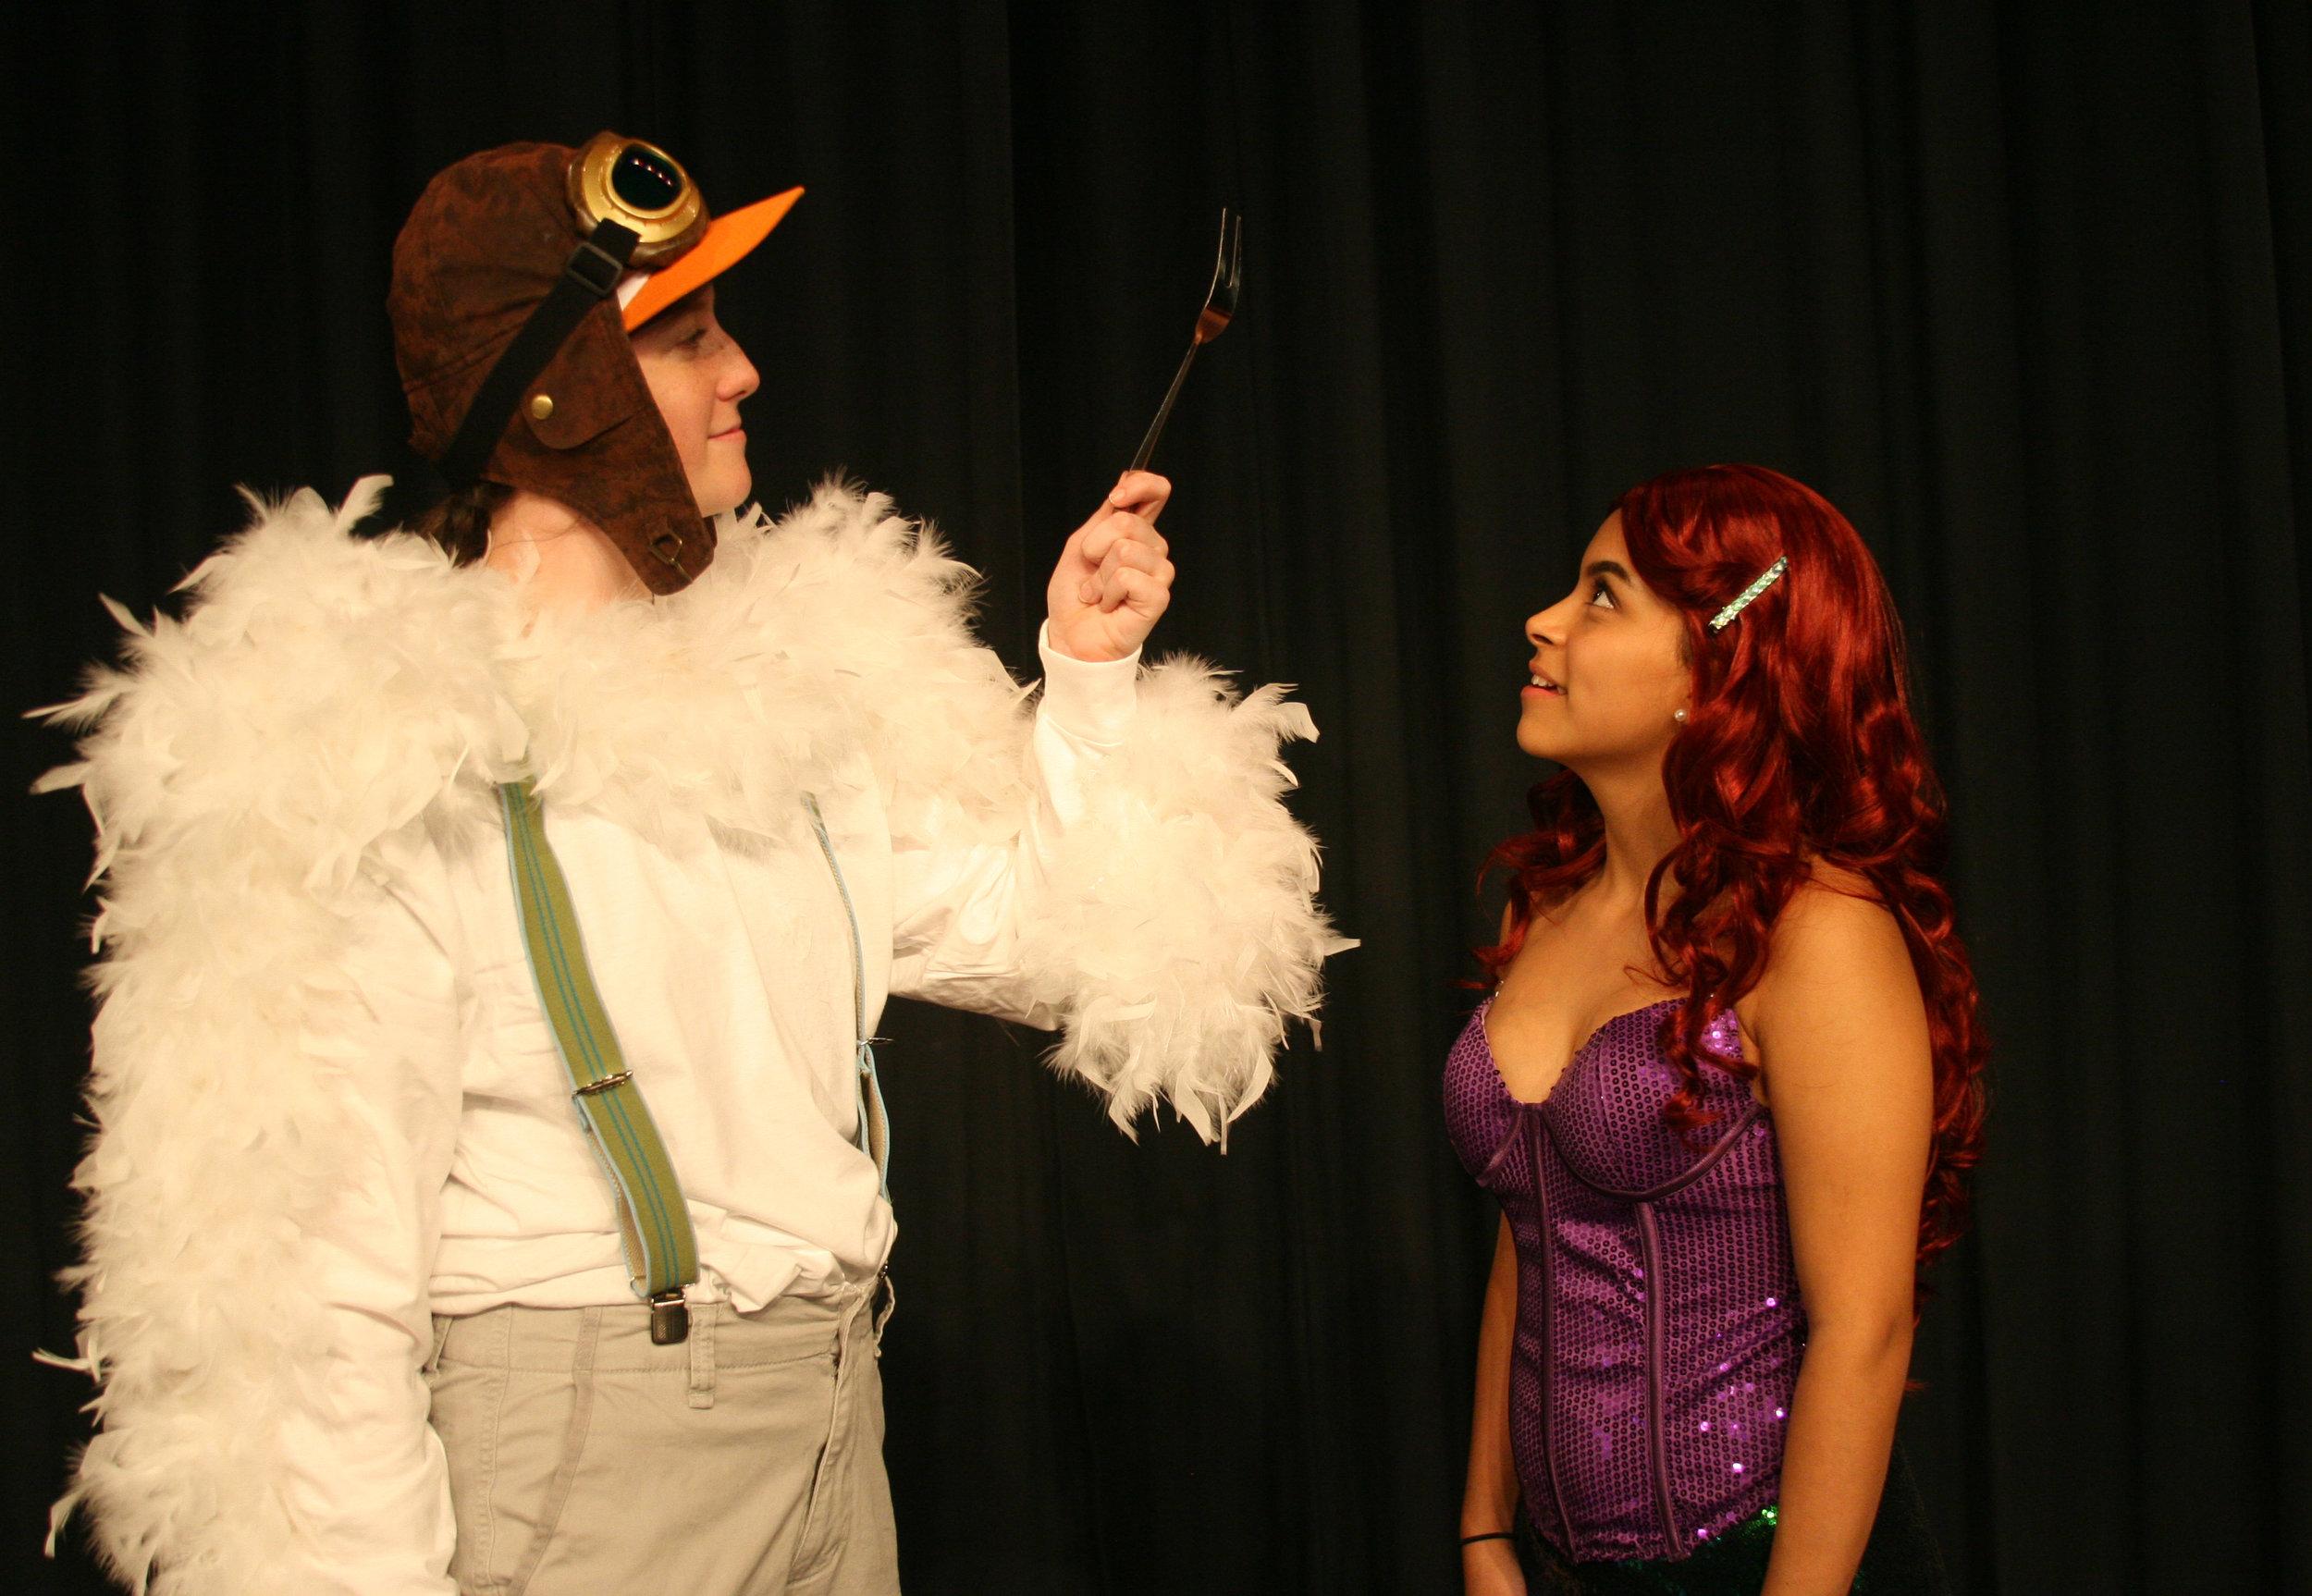 Scuttle the seagull (Jennifer Henderson) proudly displays his latest human artifact to Ariel (Jennifer Trejo Benitez).